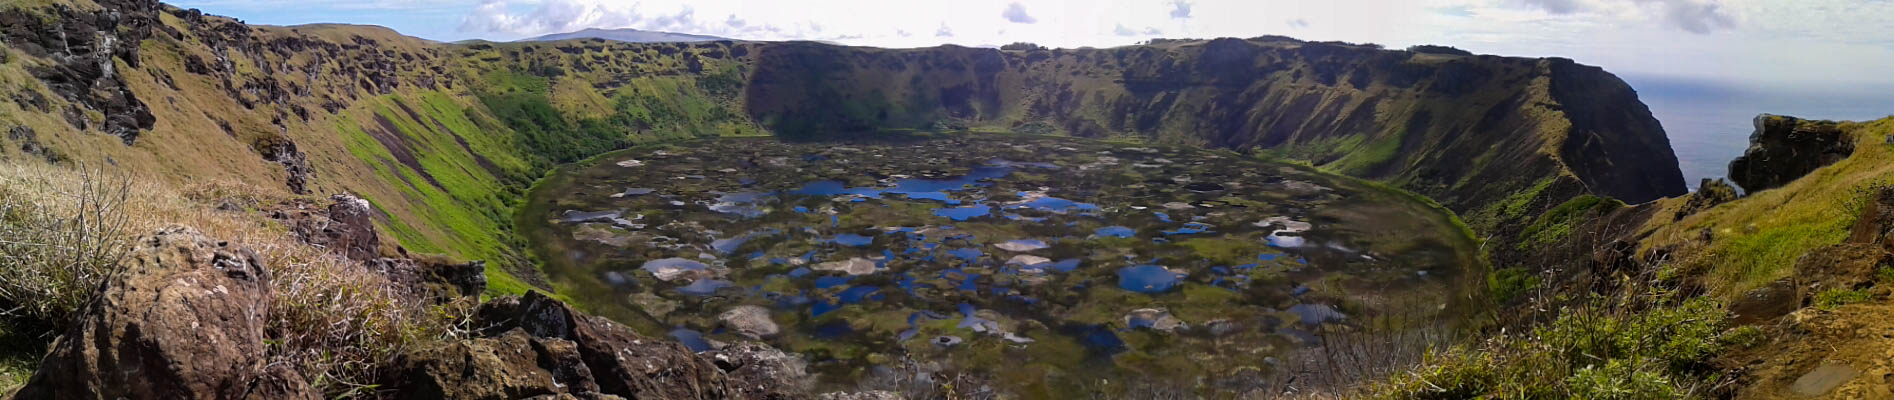 Rano Kau caldera lagoon panoramic